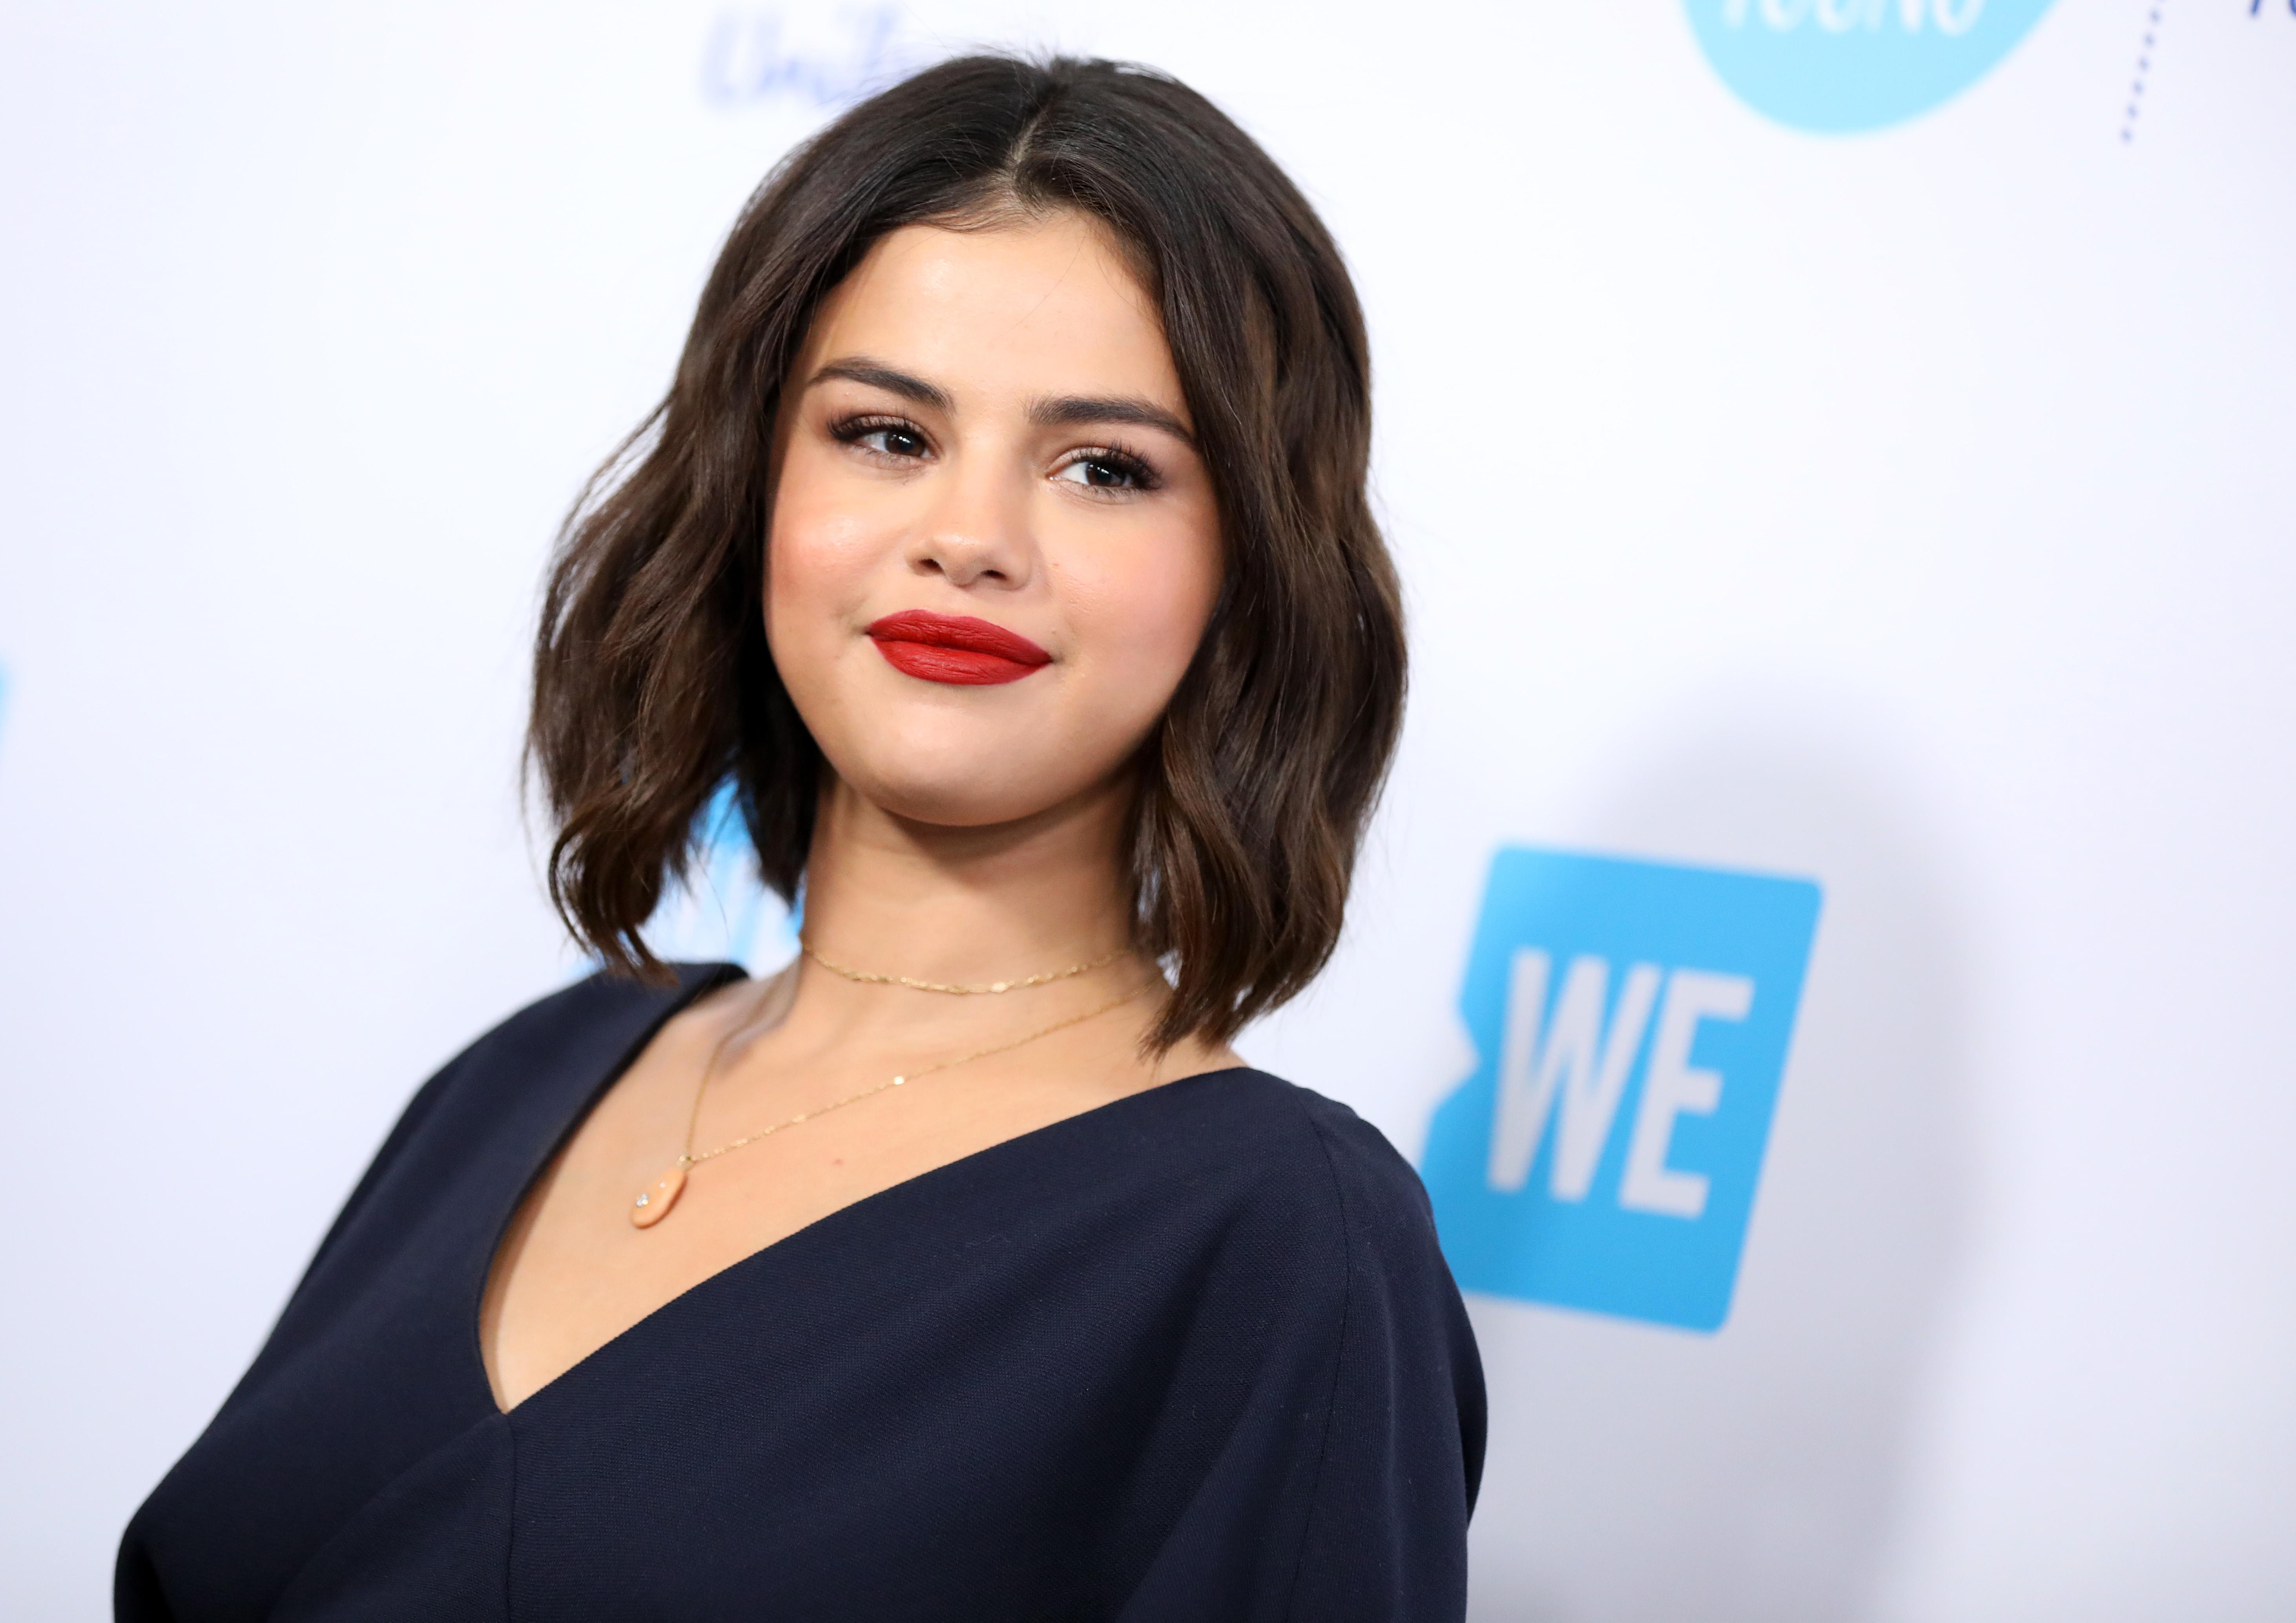 Selena Gomez is Making a Beauty Line